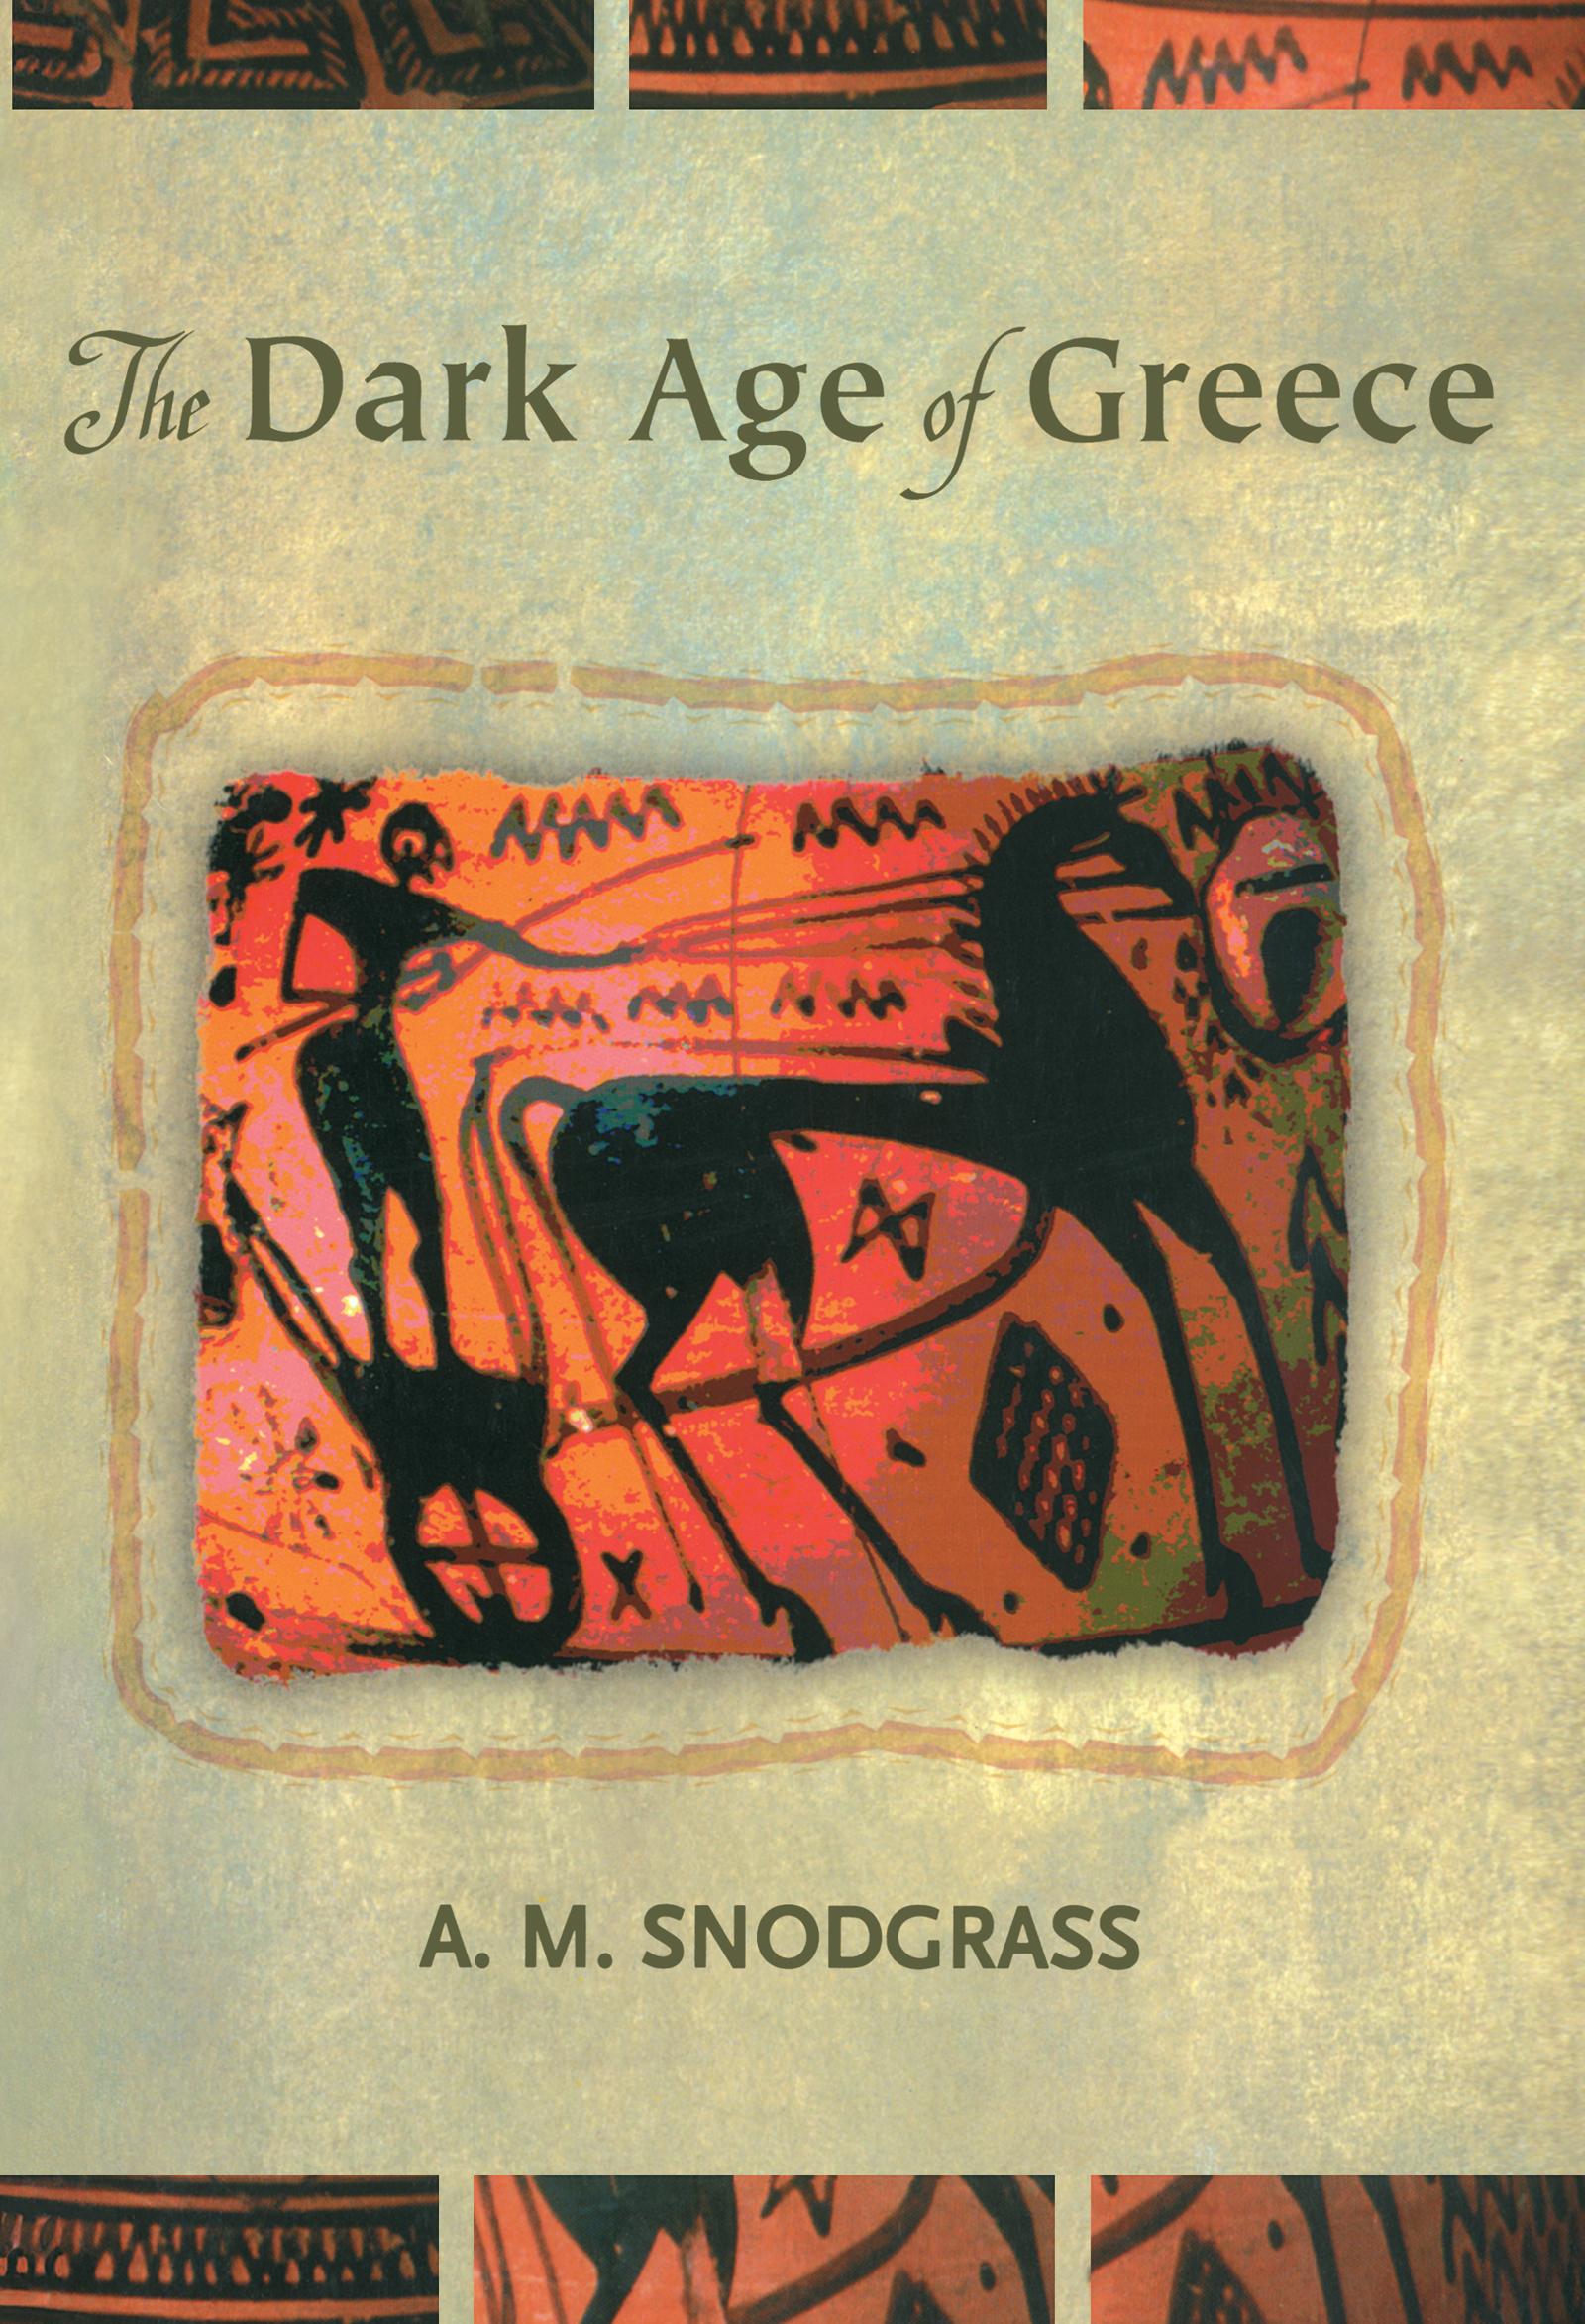 The Dark Age of Greece